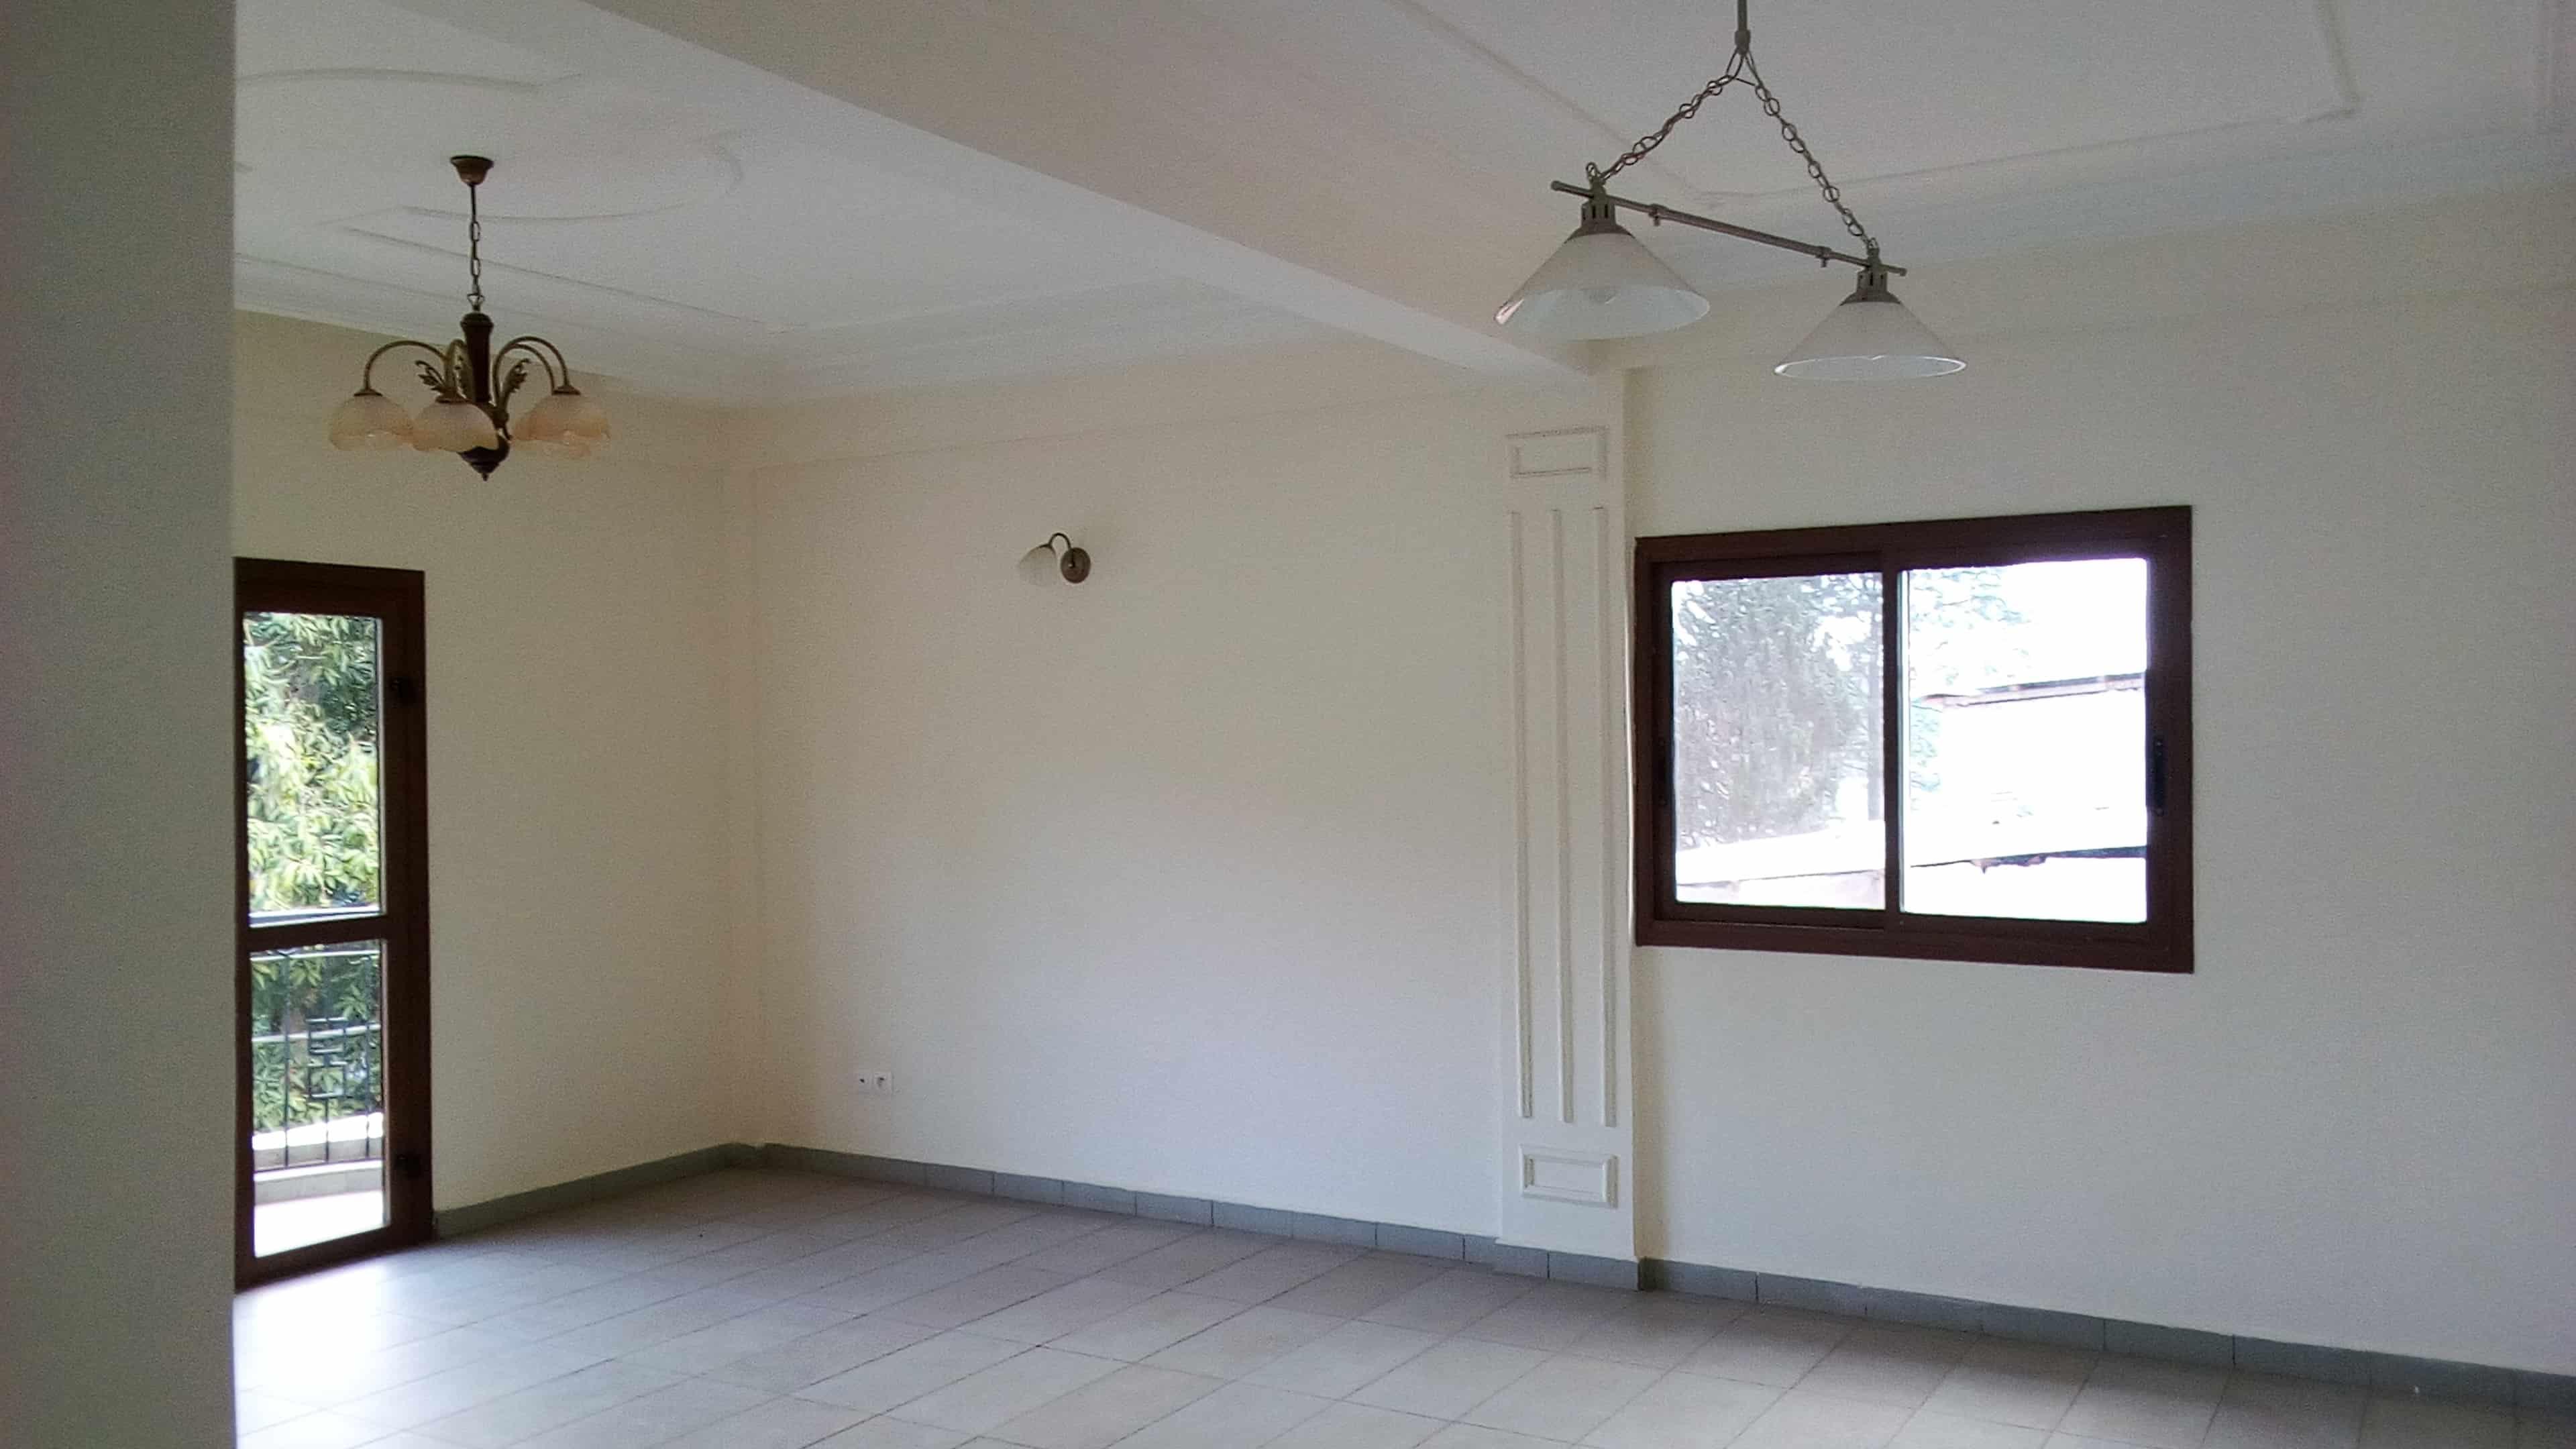 Apartment to rent - Yaoundé, Mfandena, Vers avenue foe - 1 living room(s), 2 bedroom(s), 2 bathroom(s) - 300 000 FCFA / month